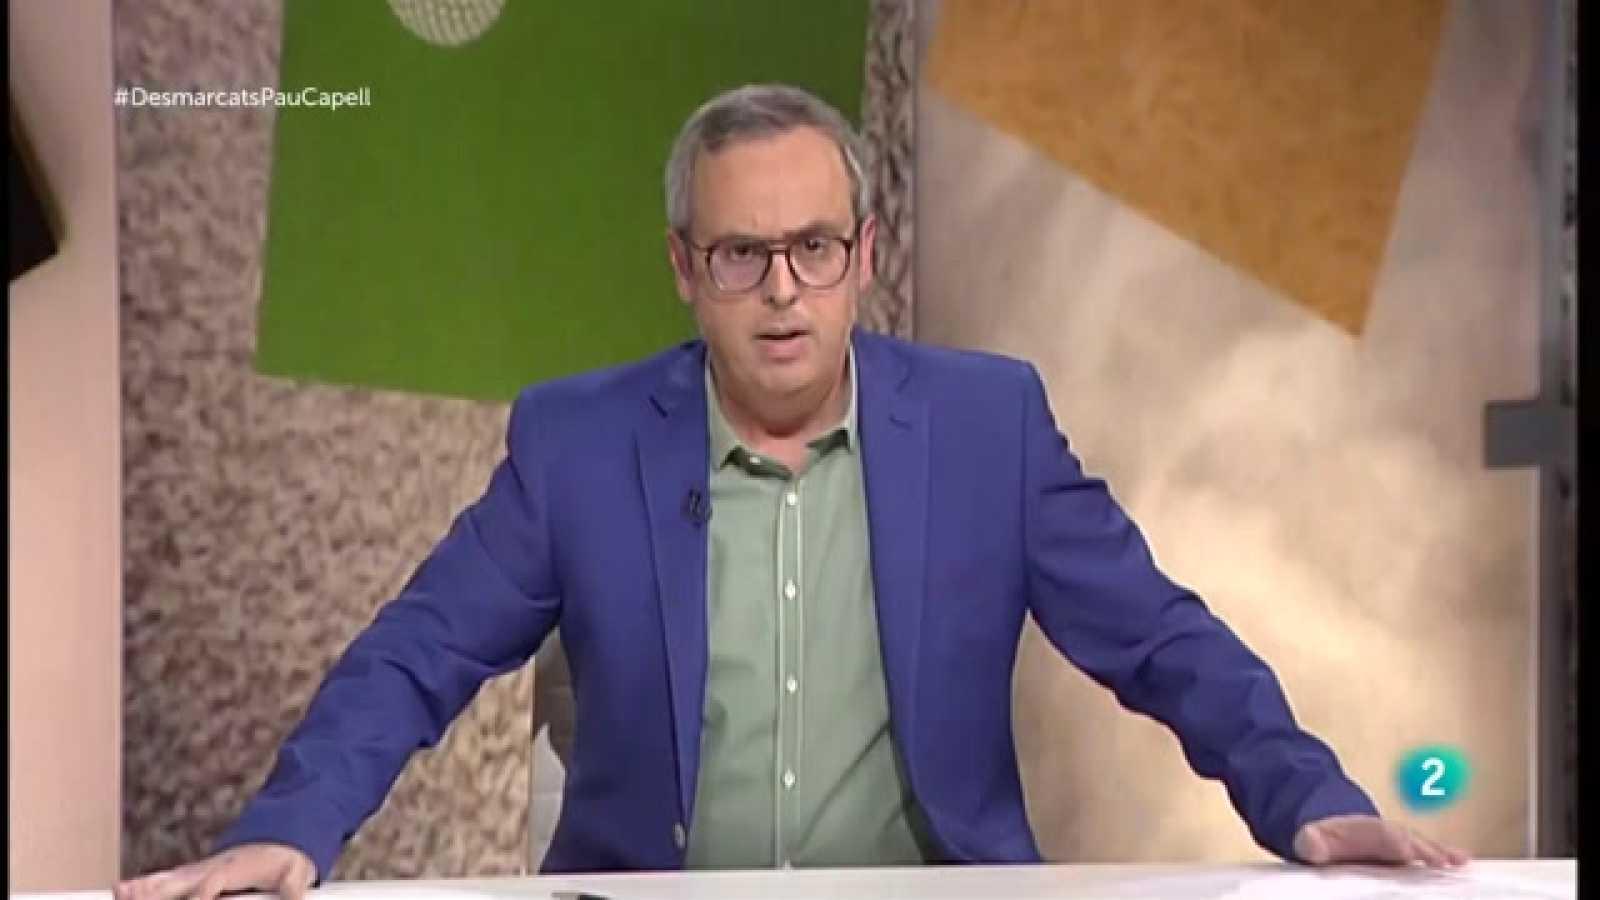 Desmarcats - Ramon Geli, president del CN Catalunya